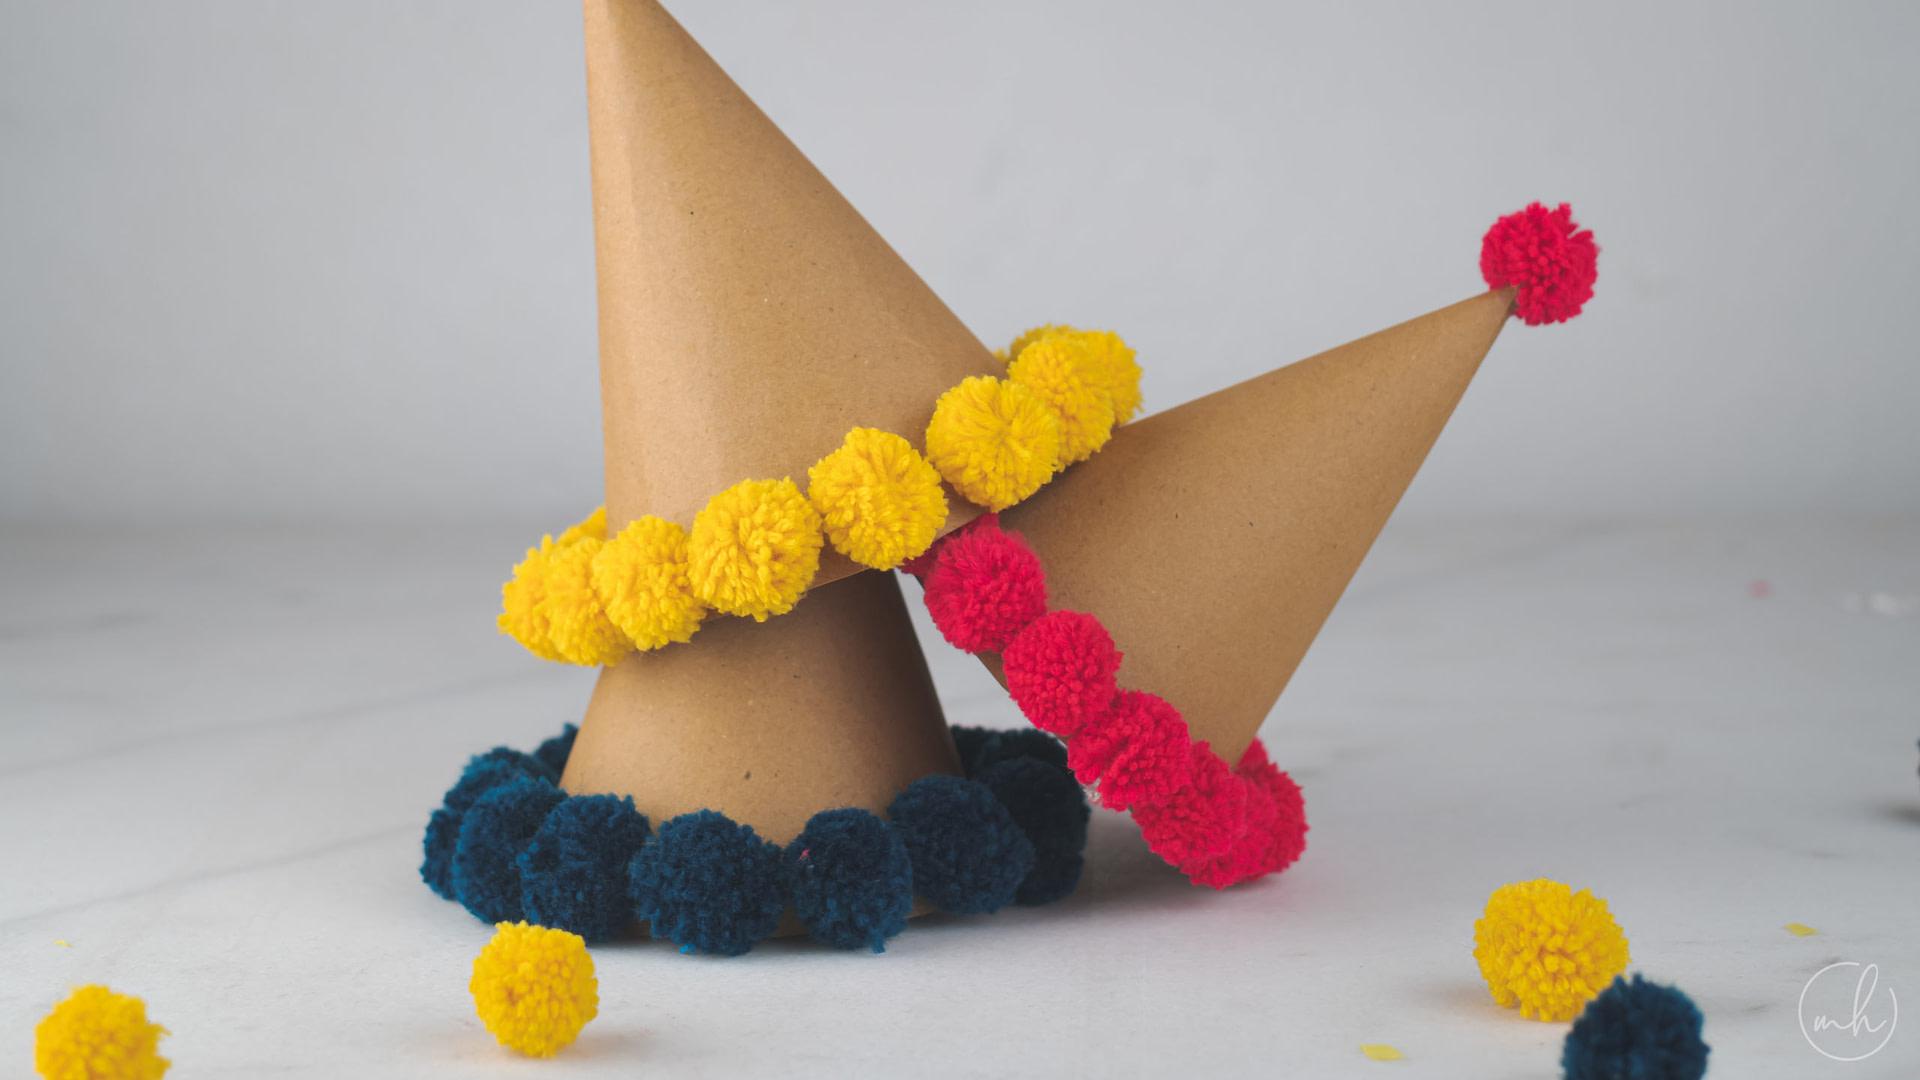 DIY: Yarn Pom Pom Party Hat | Myhoogah